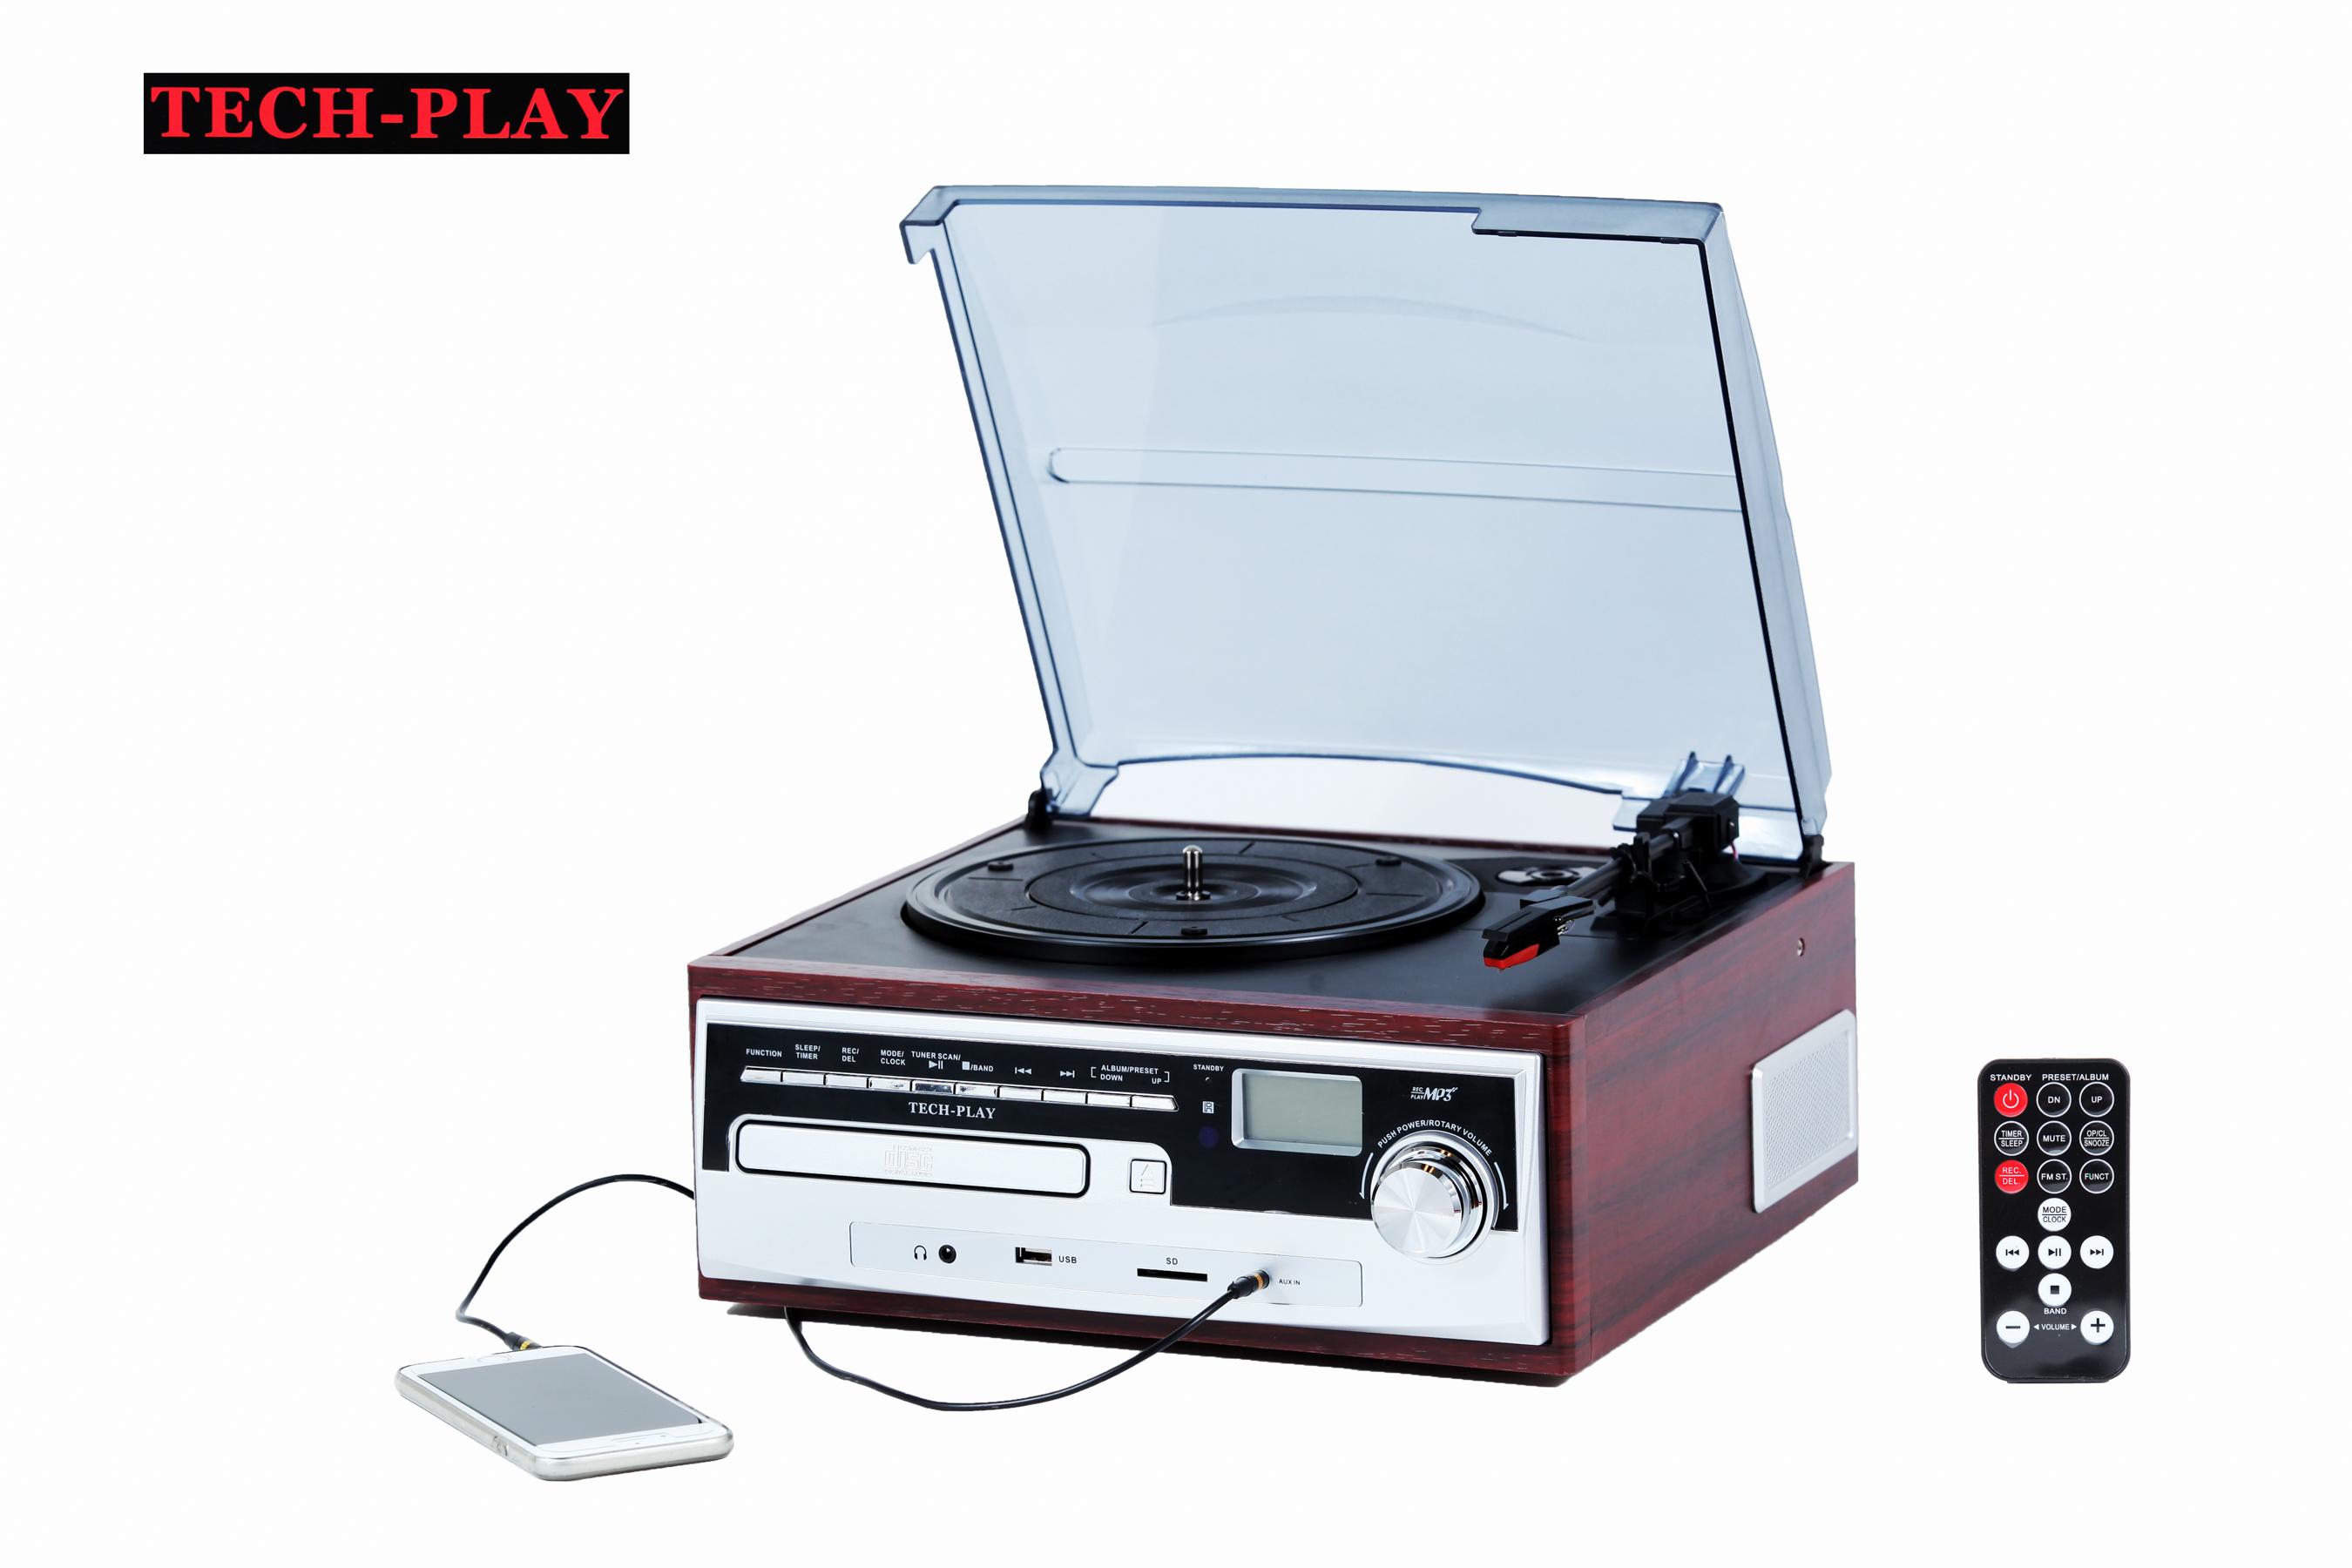 Home Audio - PoweSalez - A Consumer Electronics Wholesaler